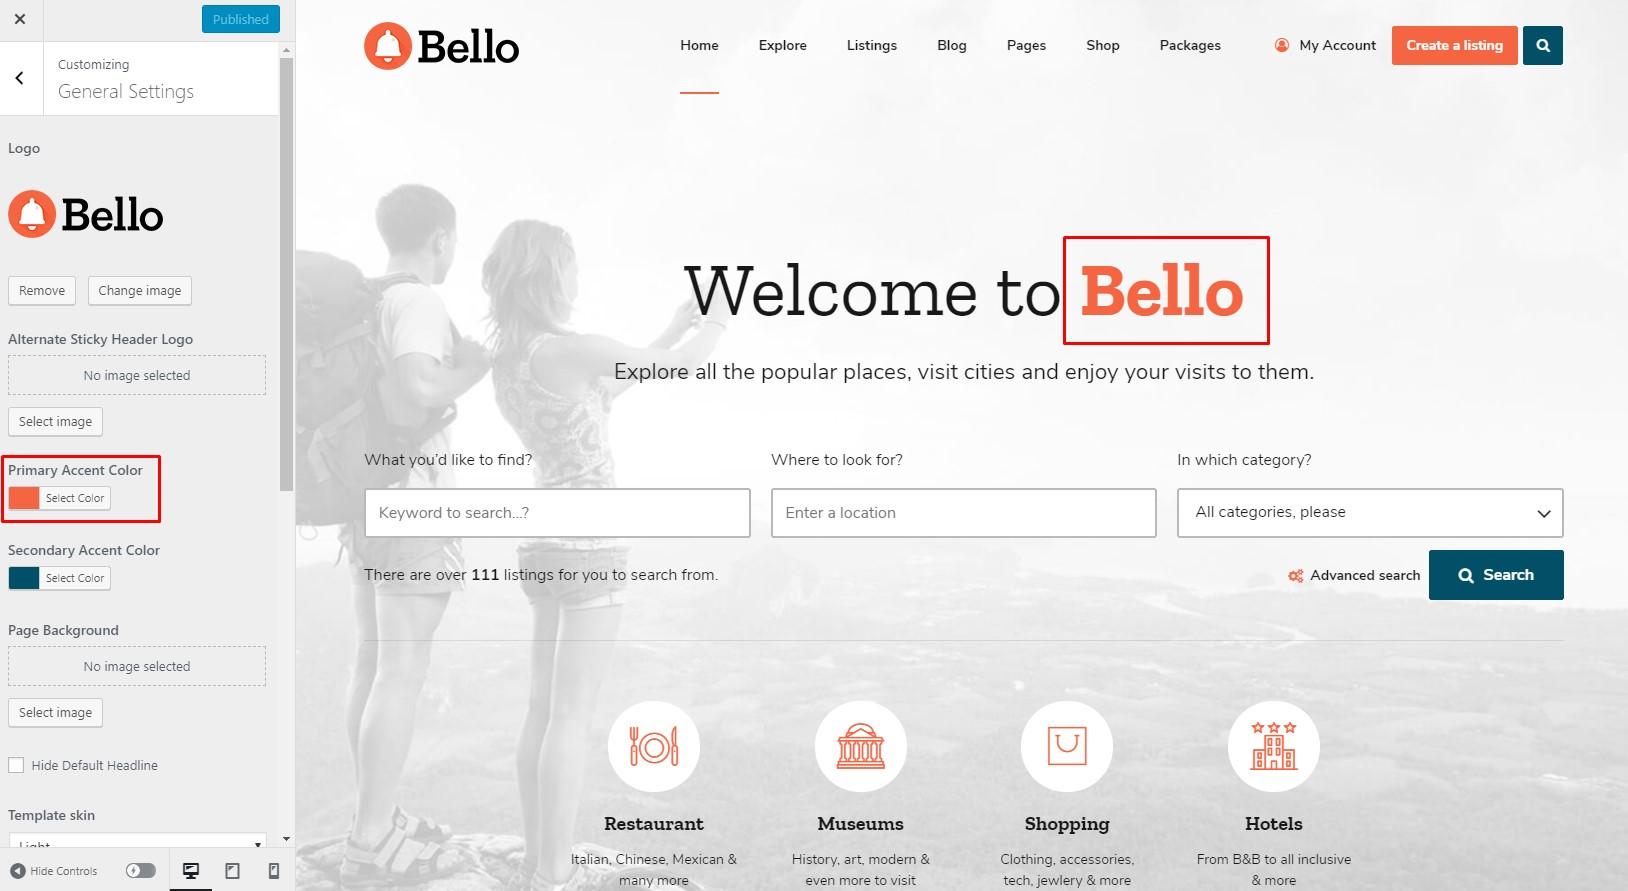 https://documentation.bold-themes.com/bello/wp-content/uploads/sites/31/2018/03/accent-color.jpg